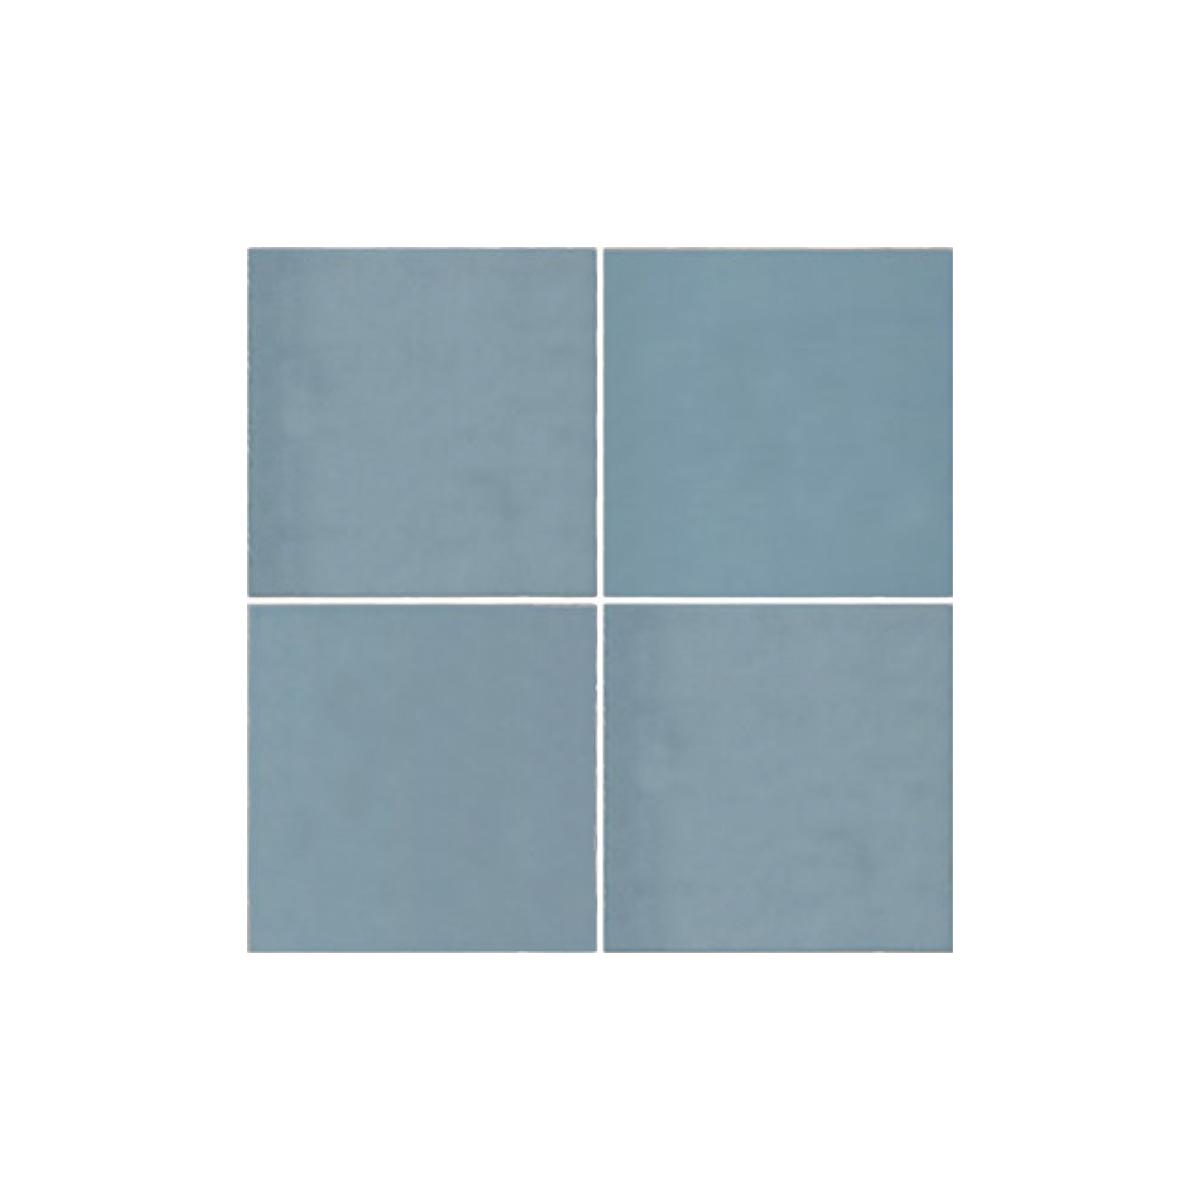 Casablanca - Baby Blue - Square Feature Tiles - 120x120mm